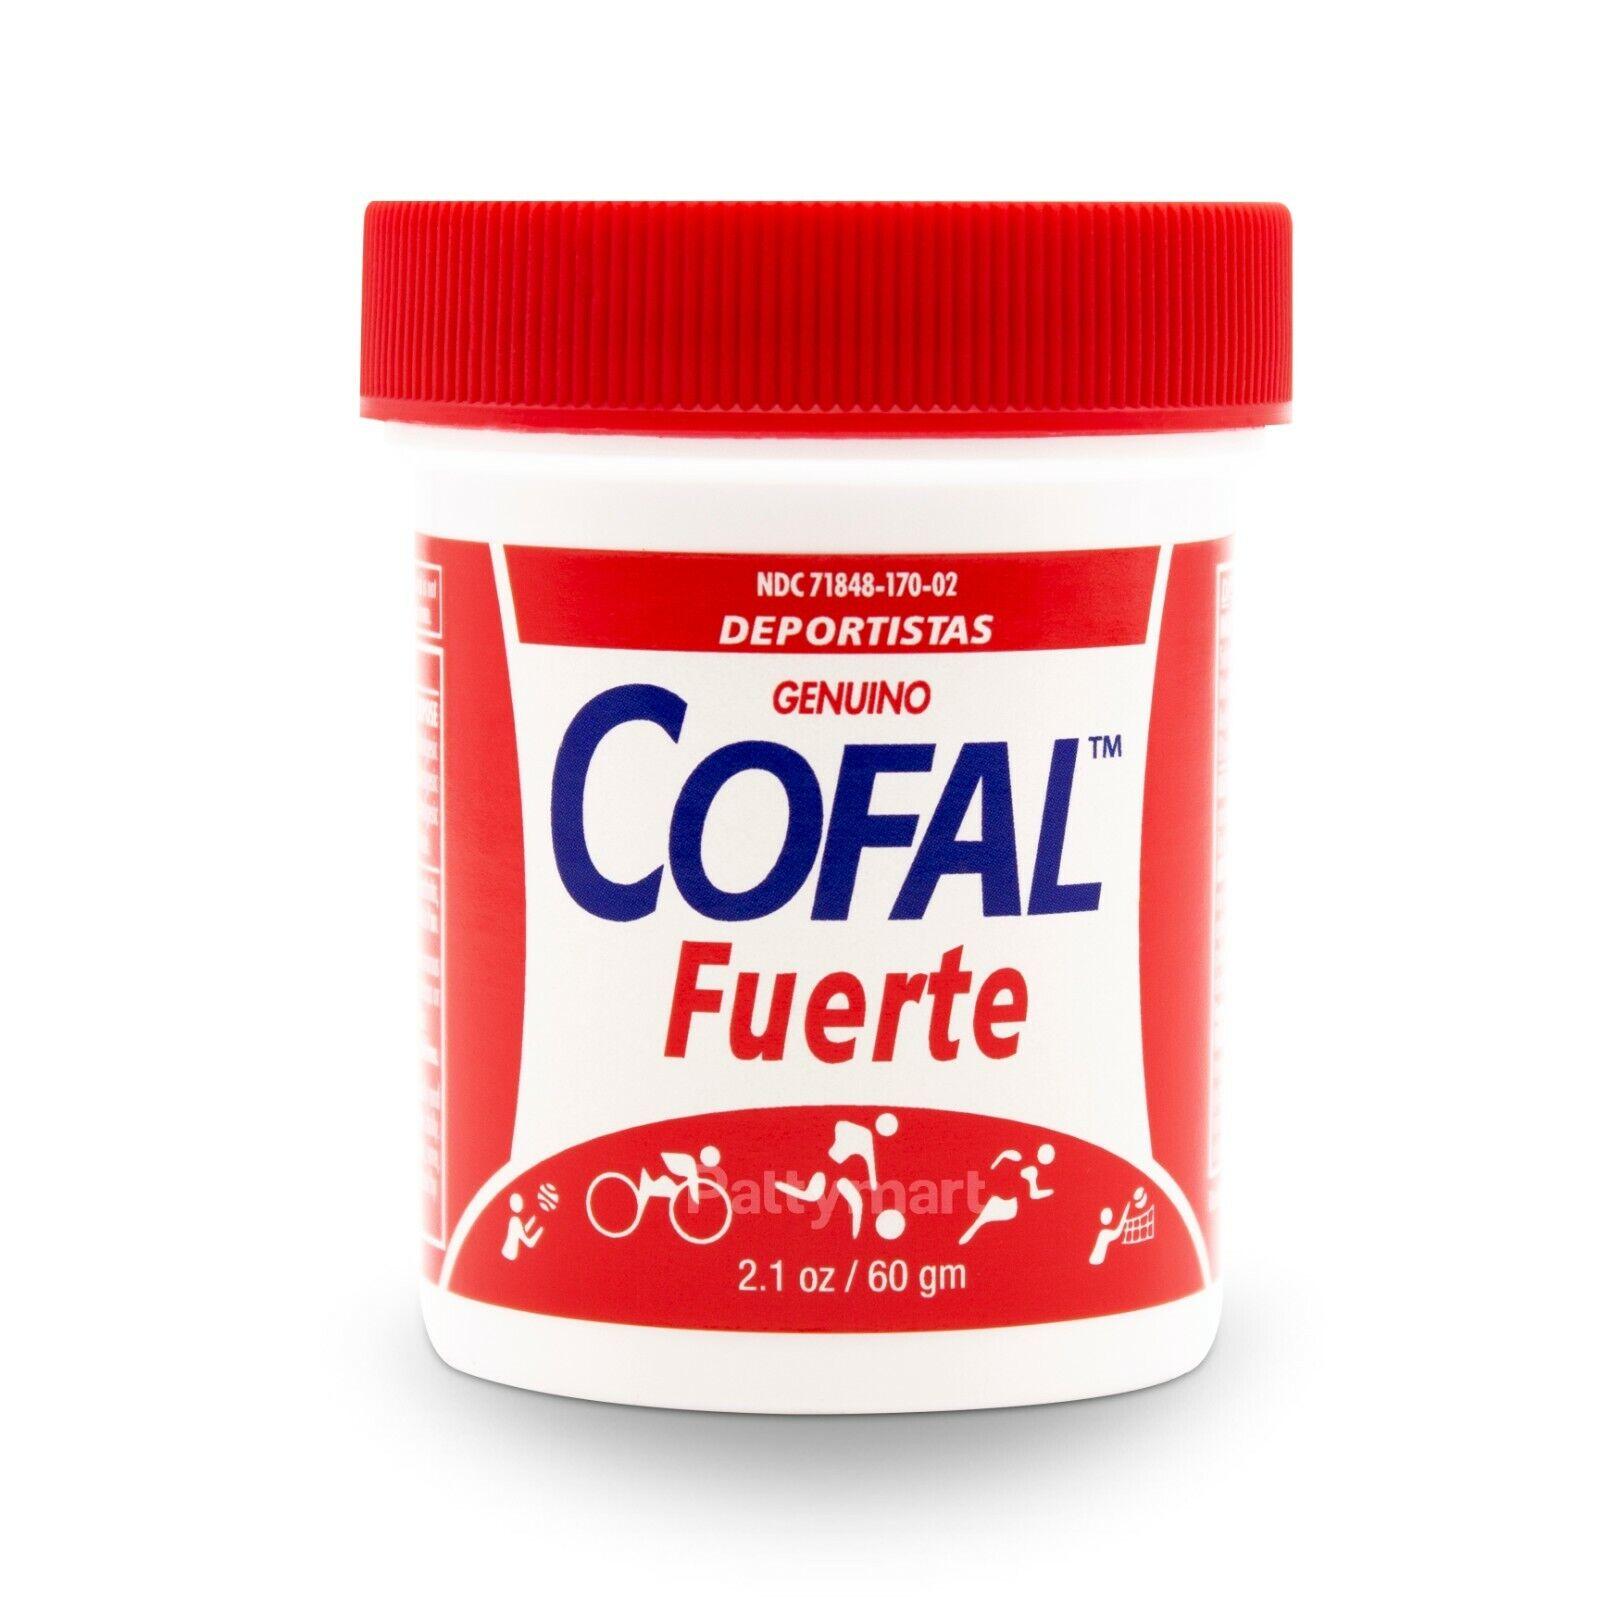 COFAL FUERTE GENUINO PARA DOLOR 2.1 OZ - FOR MUSCULAR PAIN, ARTHRITIS, BACK PAIN